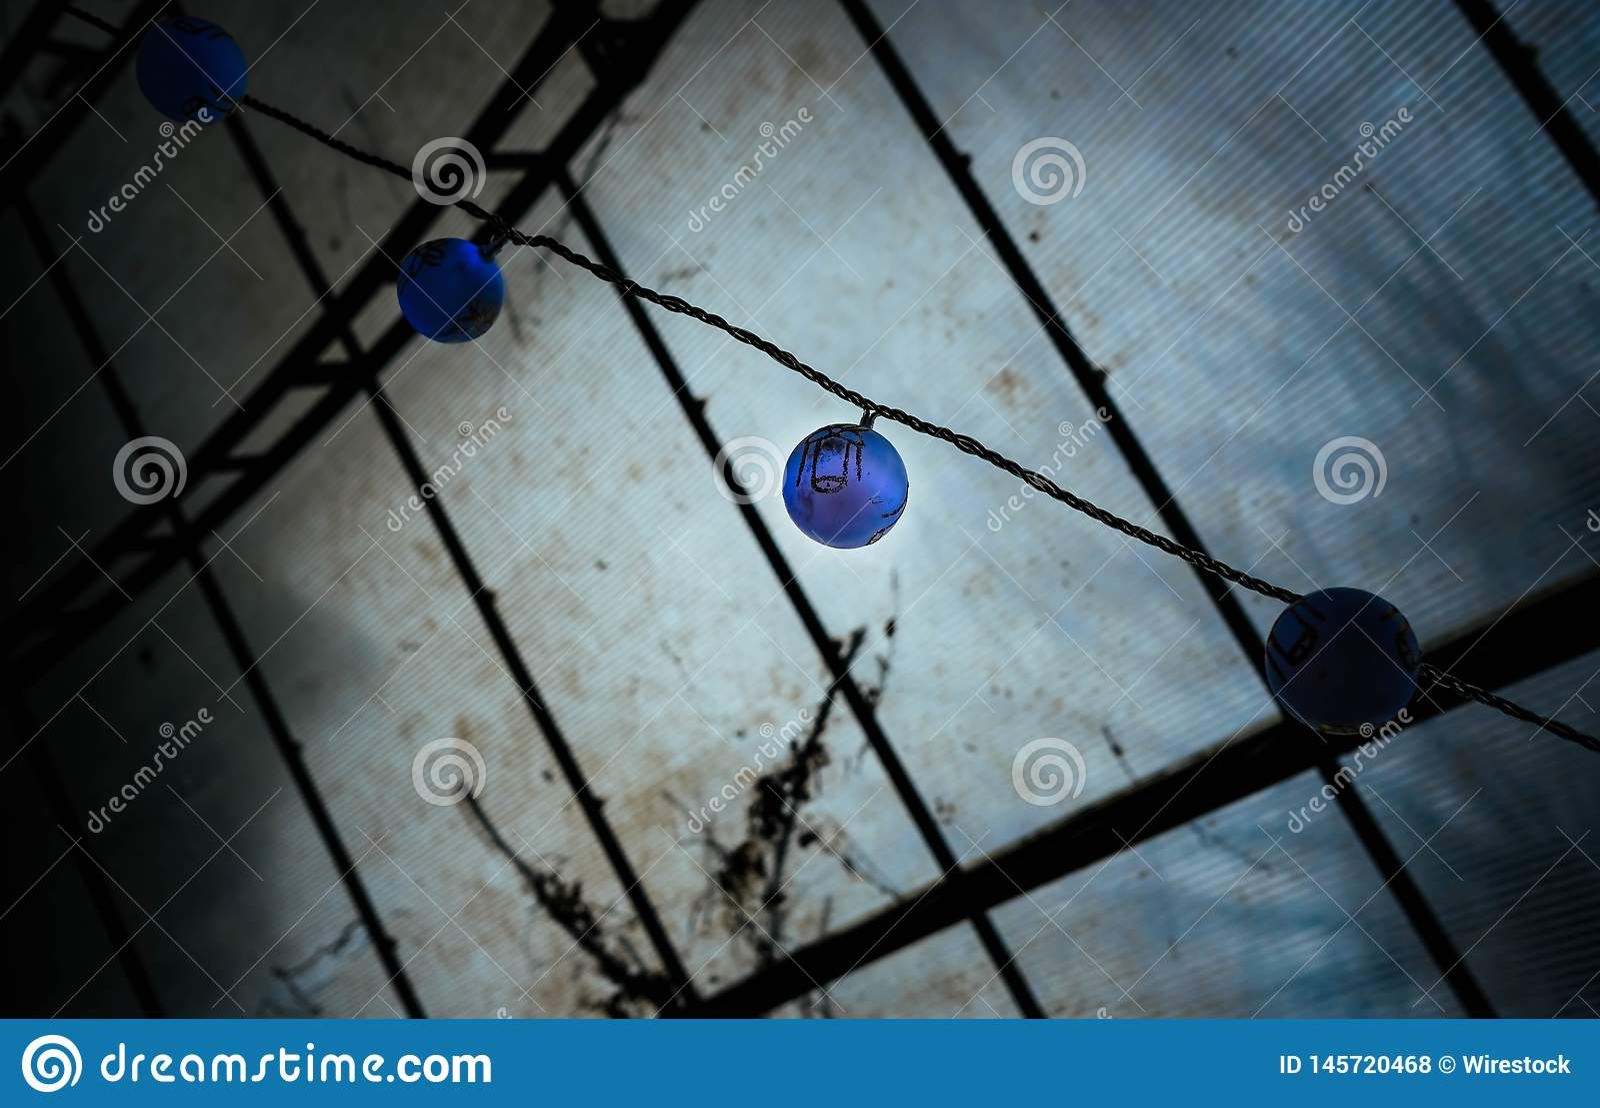 Lámparas asiáticas azules exóticas del estilo